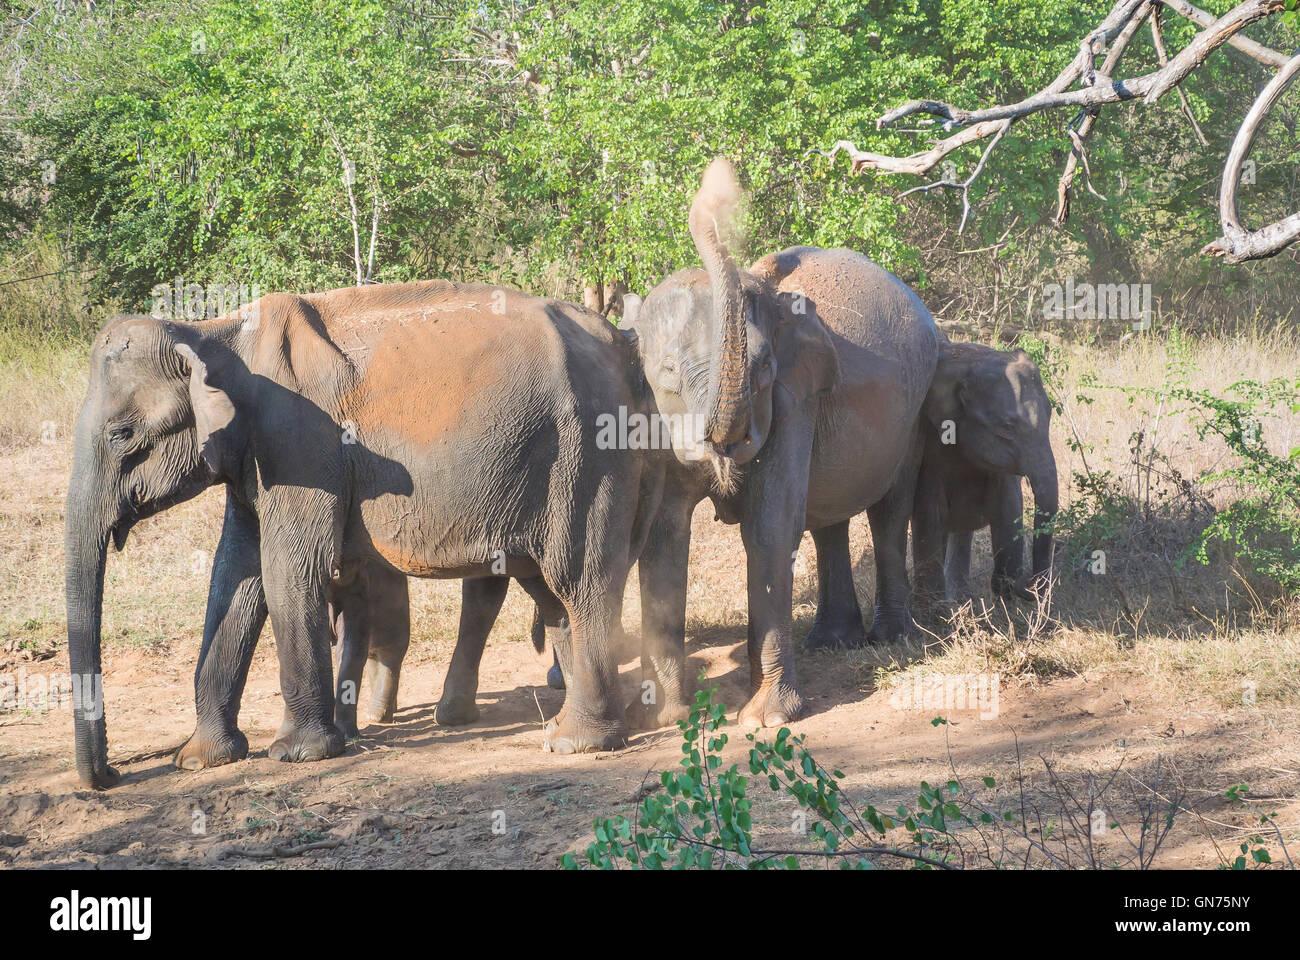 Elephants at the Udawalawe National Park, Sri Lanka - Stock Image